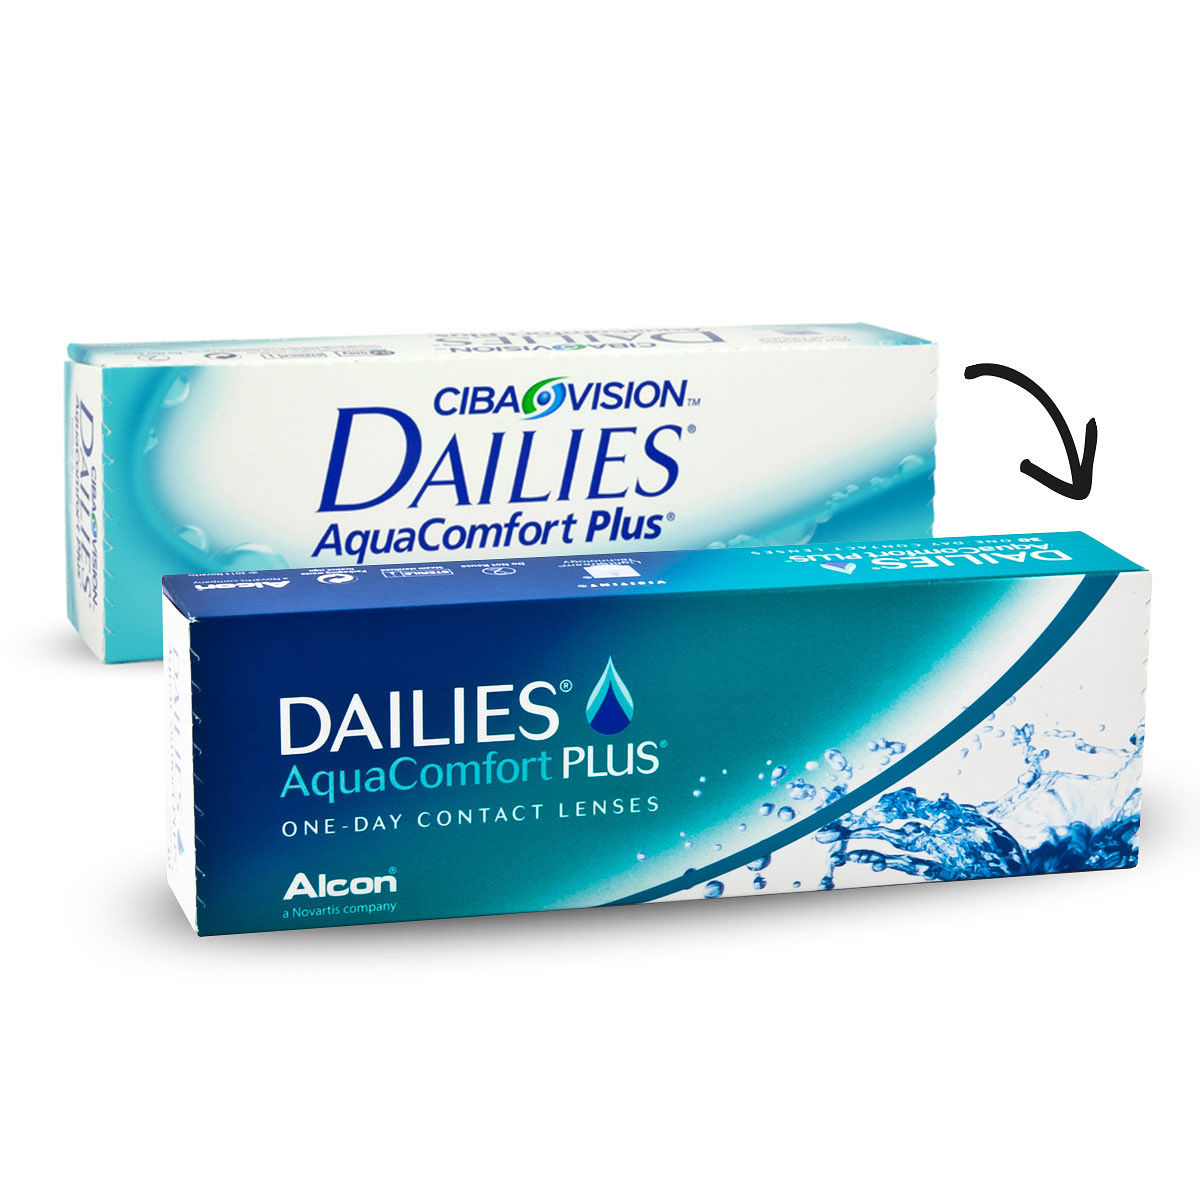 DAILIES AquaComfort Plus คอนแทคเลนส์รายวัน แพค 15 คู่ / 30 ชิ้น